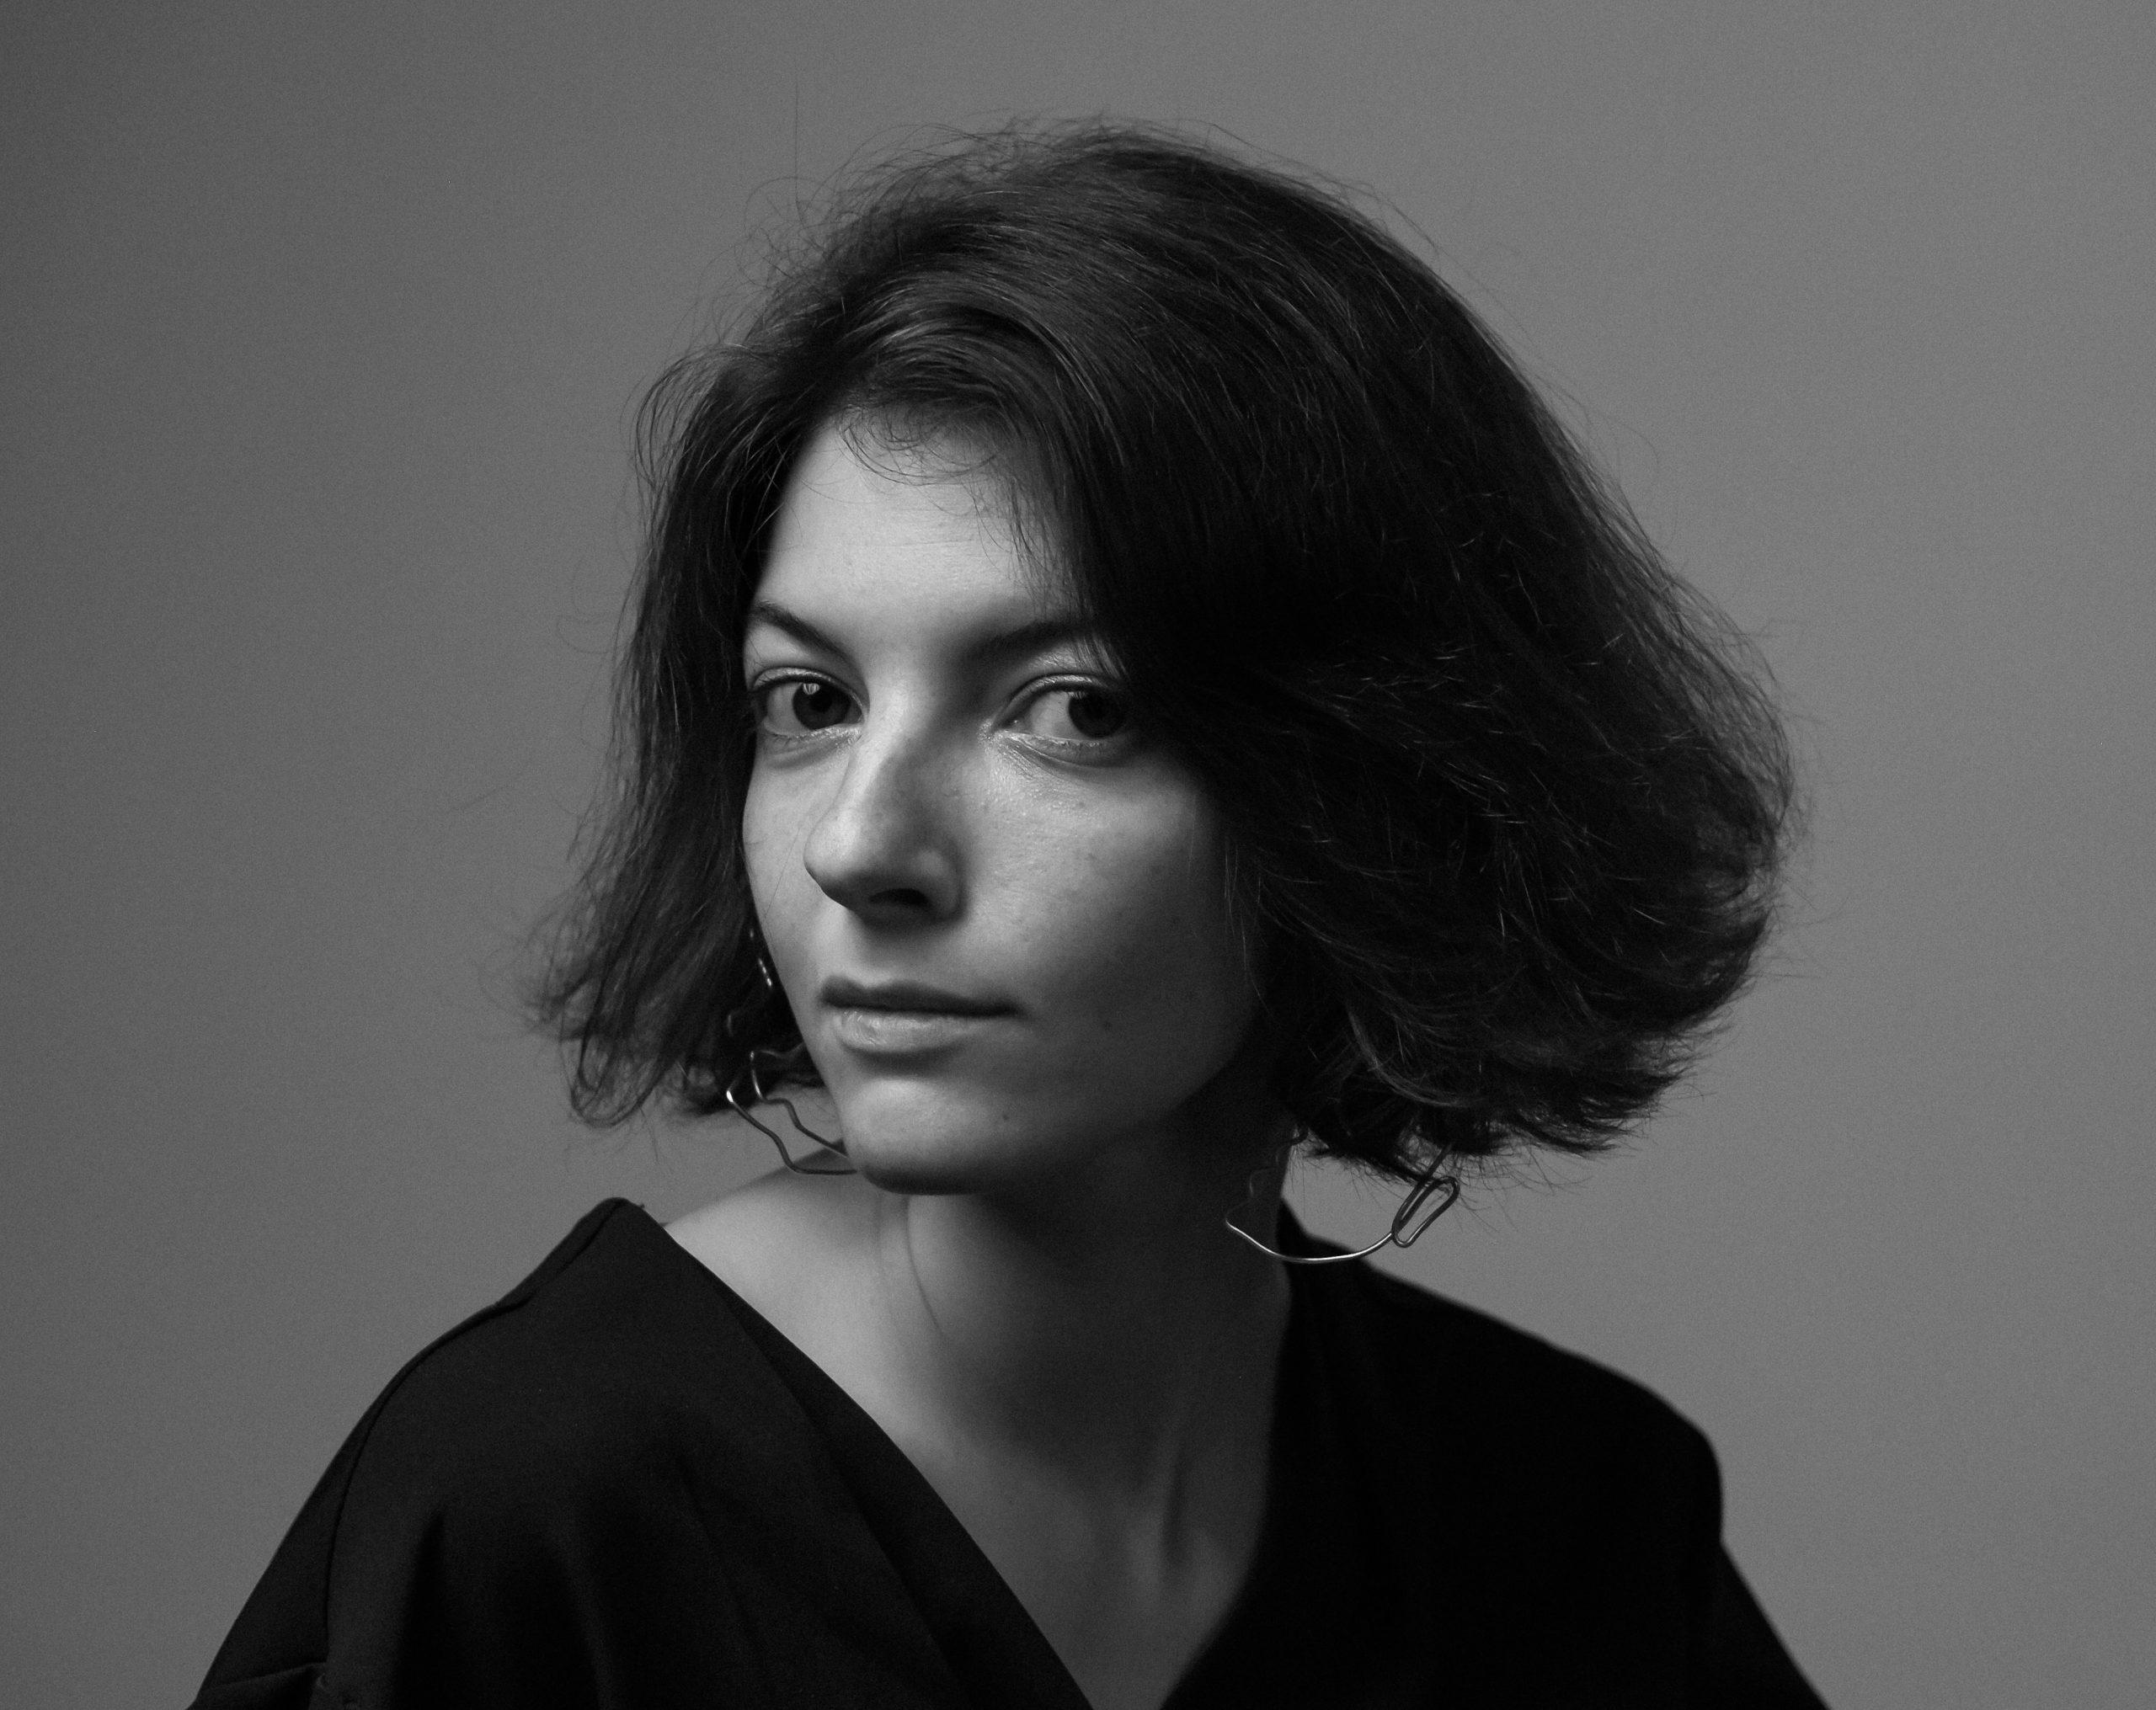 Ksenia Plisetskaya